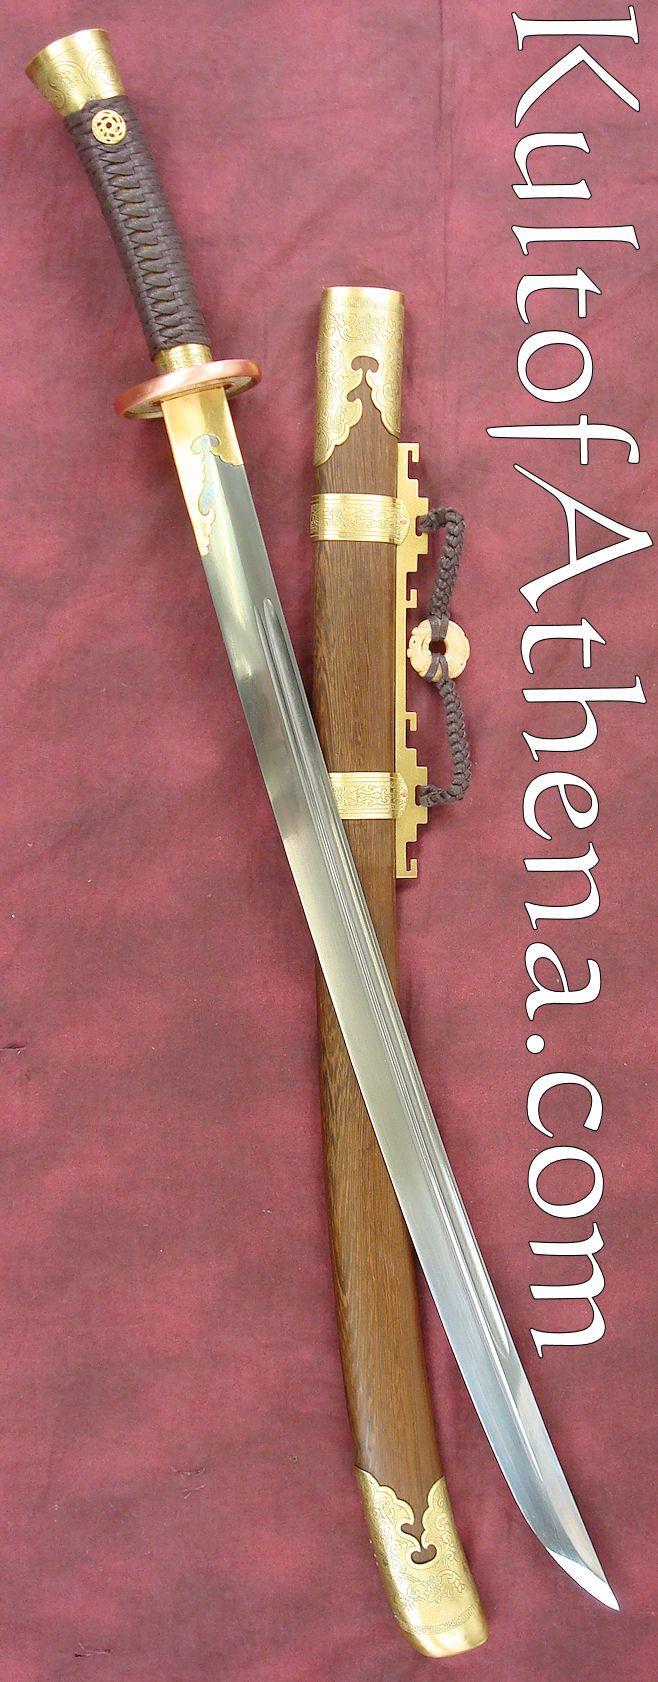 Yanmaodao Sword